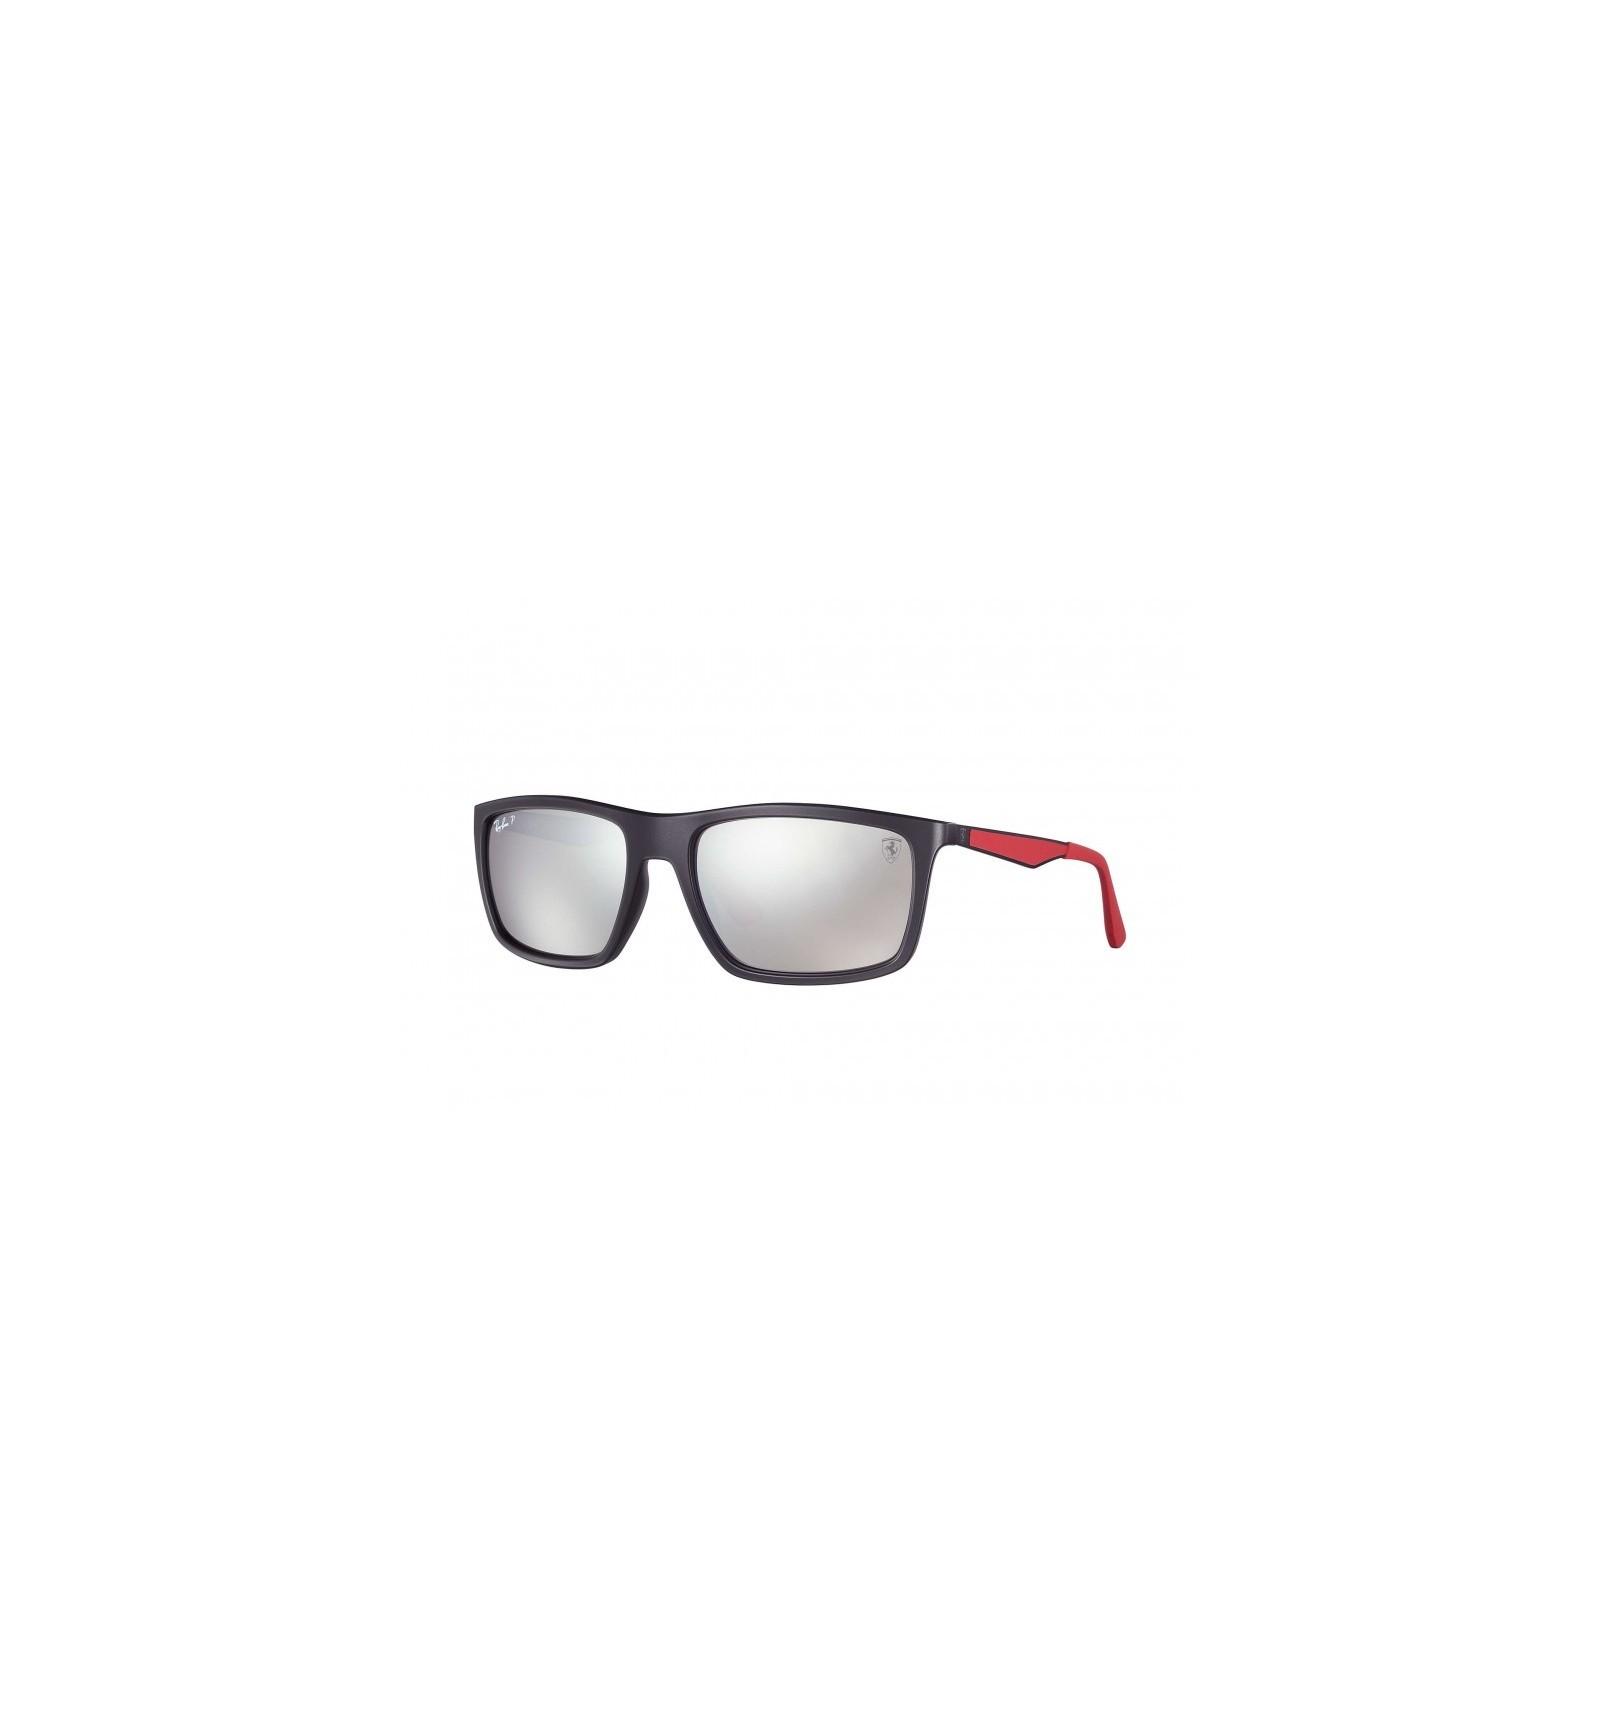 sol Chromance 4195M Mirror Ferrari Plata de Gafas Negro BAN RAY pRqf5Cxw 940d203d8b0d